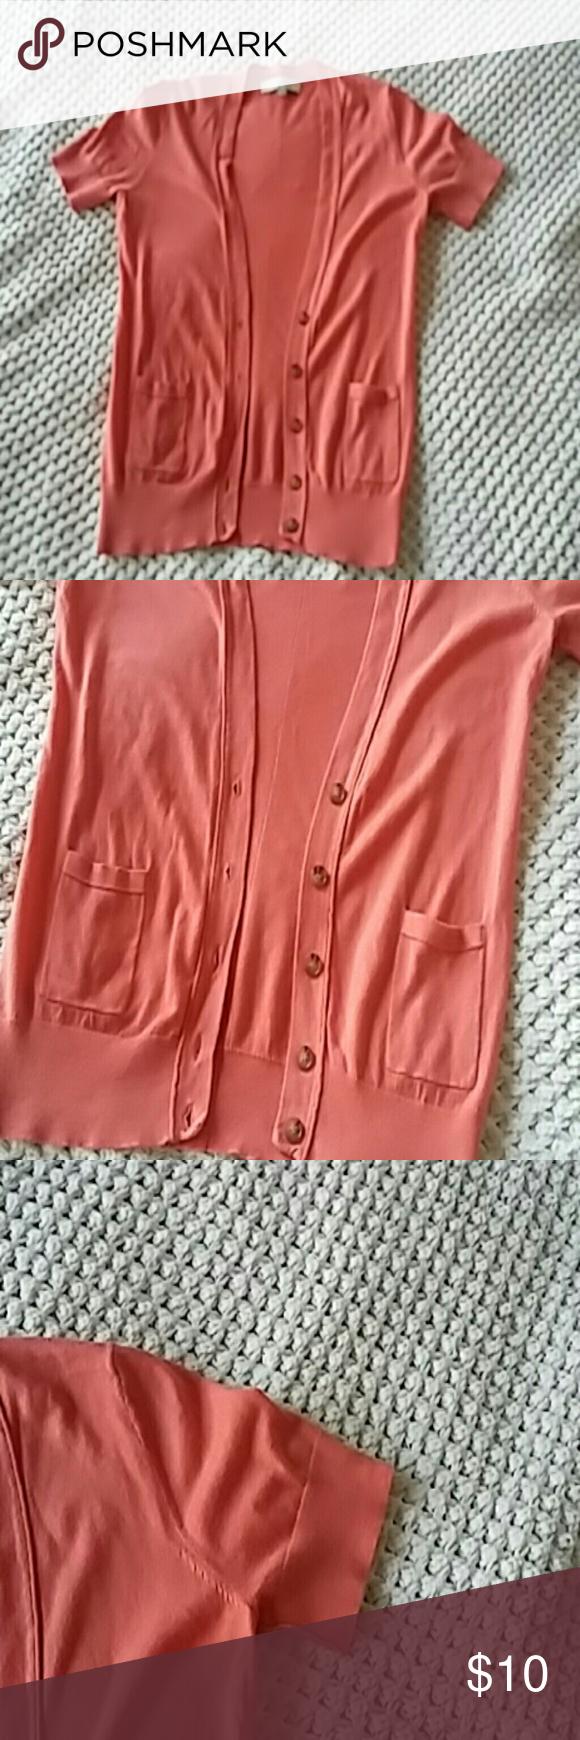 3/$15 LOFT Coral Cardigan | Coral cardigan, Lofts and Short sleeves